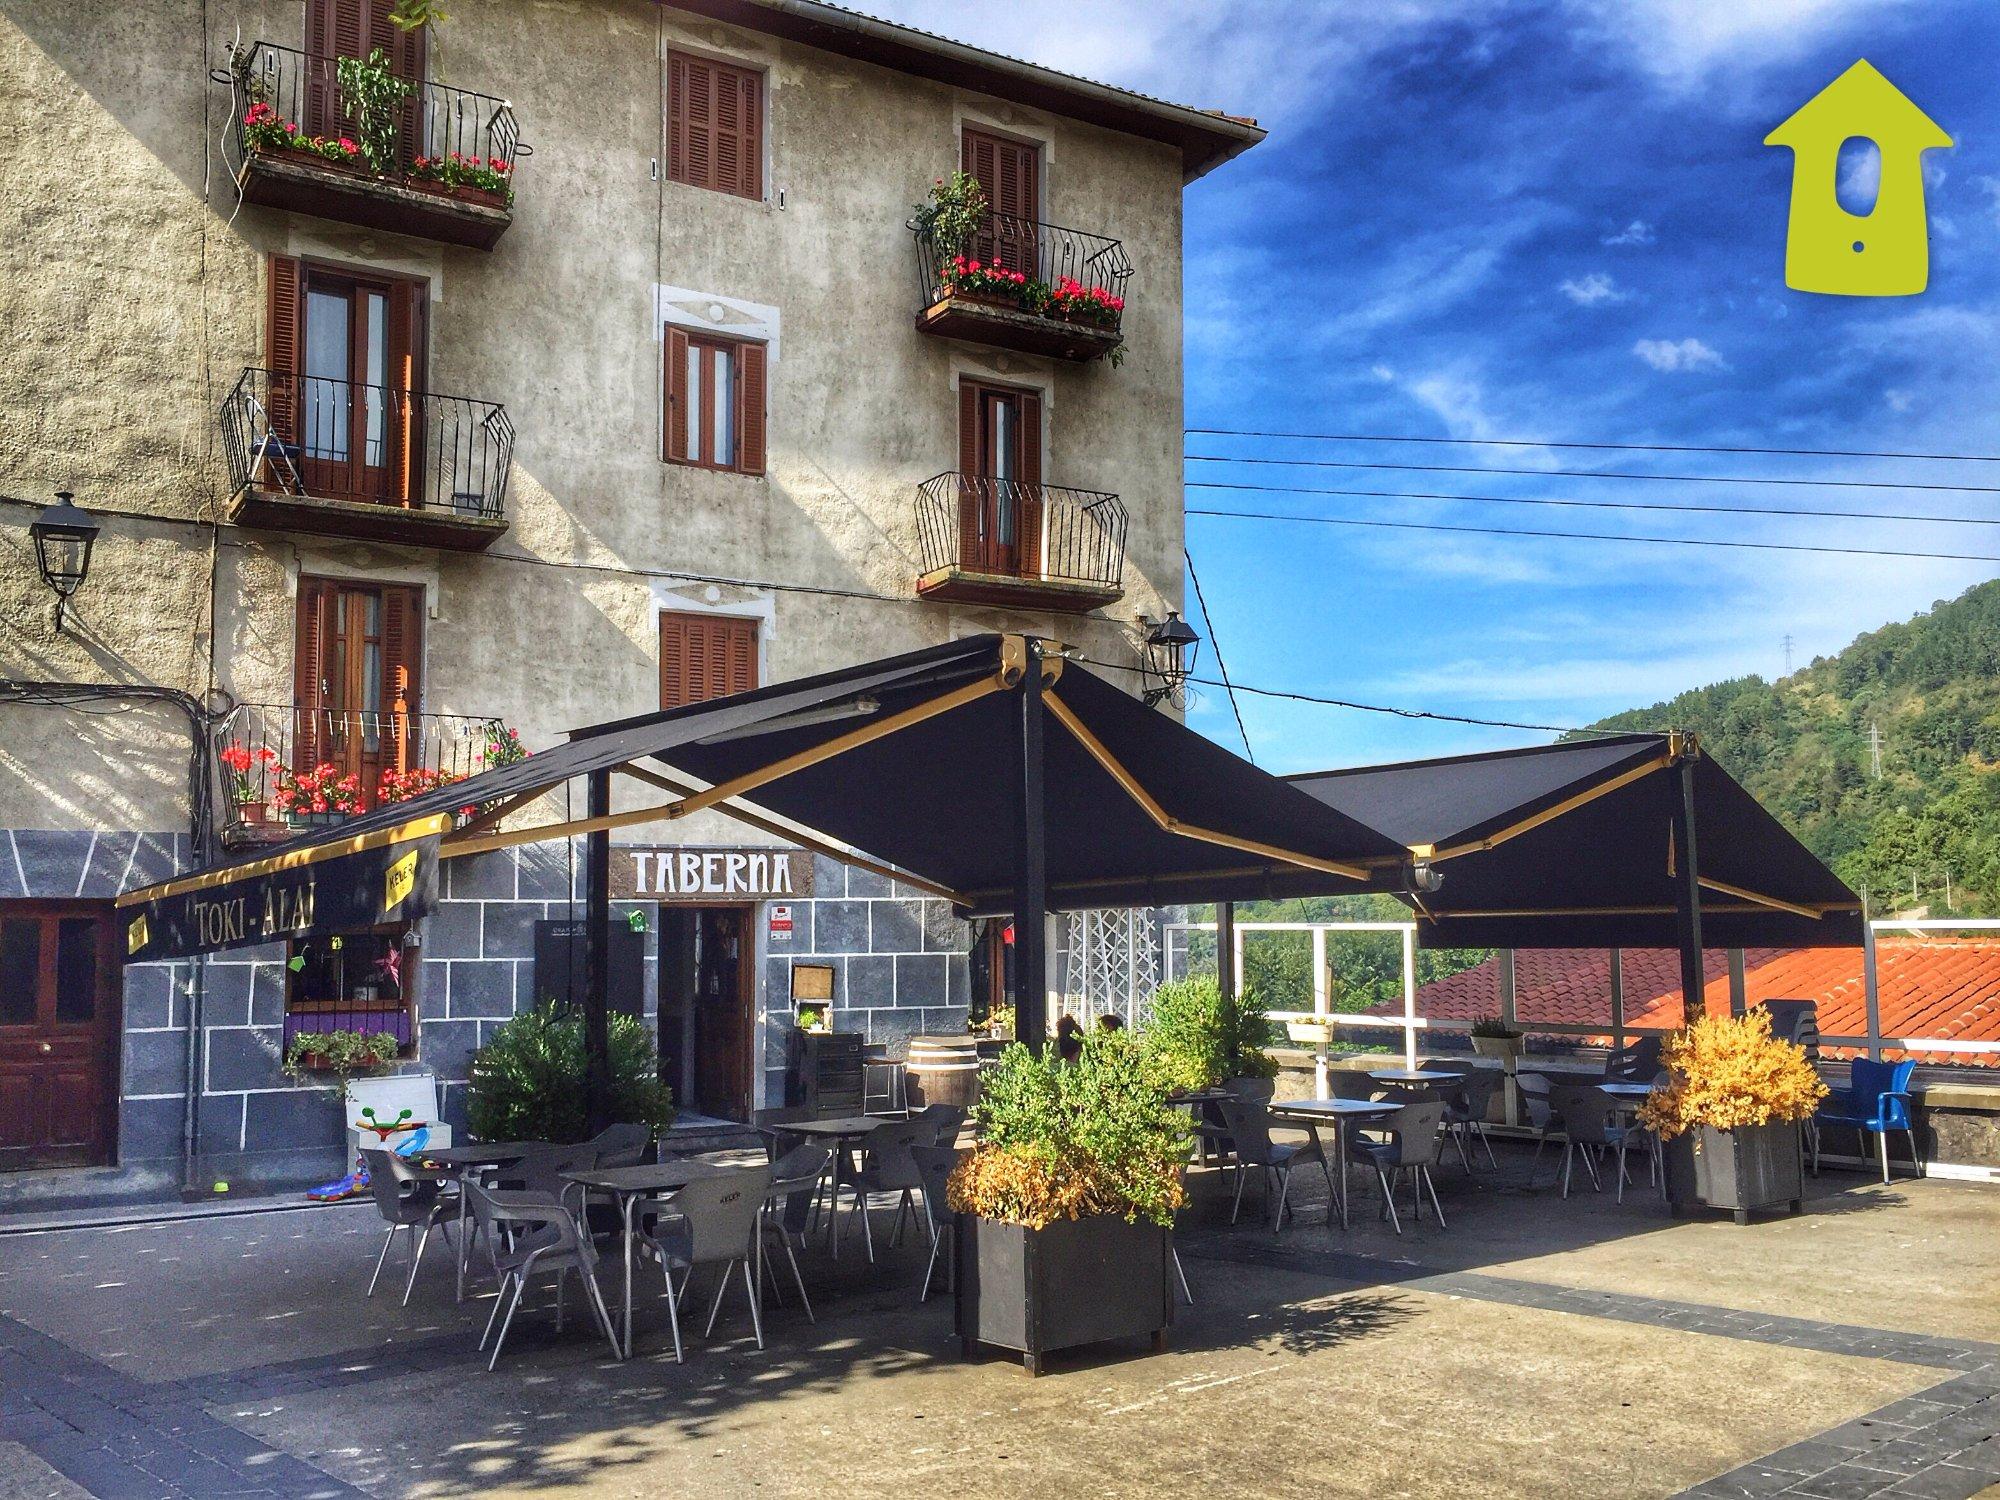 Province of Guipuzcoa, Spain Food Guide: 10 Mediterranean food Must-Eat Restaurants & Street Food Stalls in Ordizia